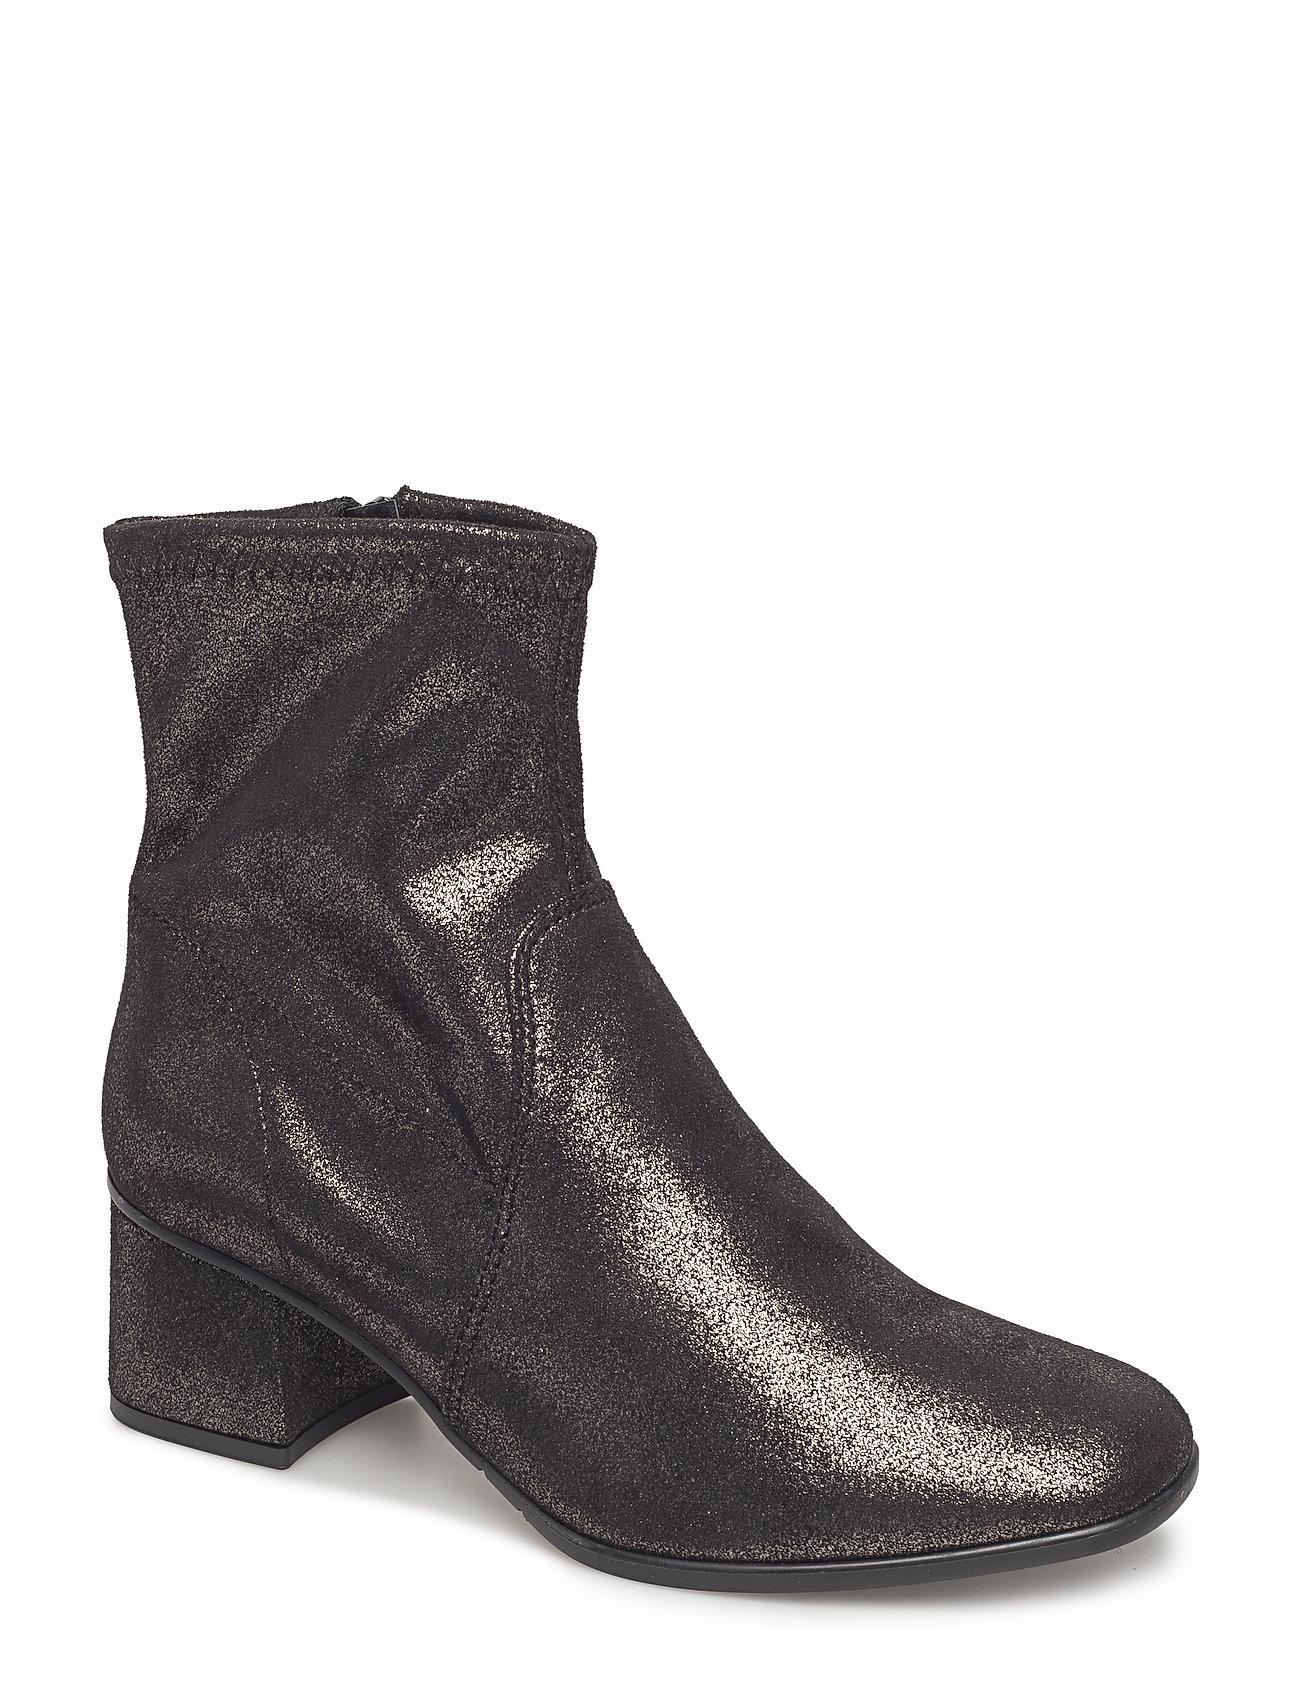 19b0d569869b LIPSTICK Tamaris Woms Boots ankelstøvler for dame - Pashion.dk